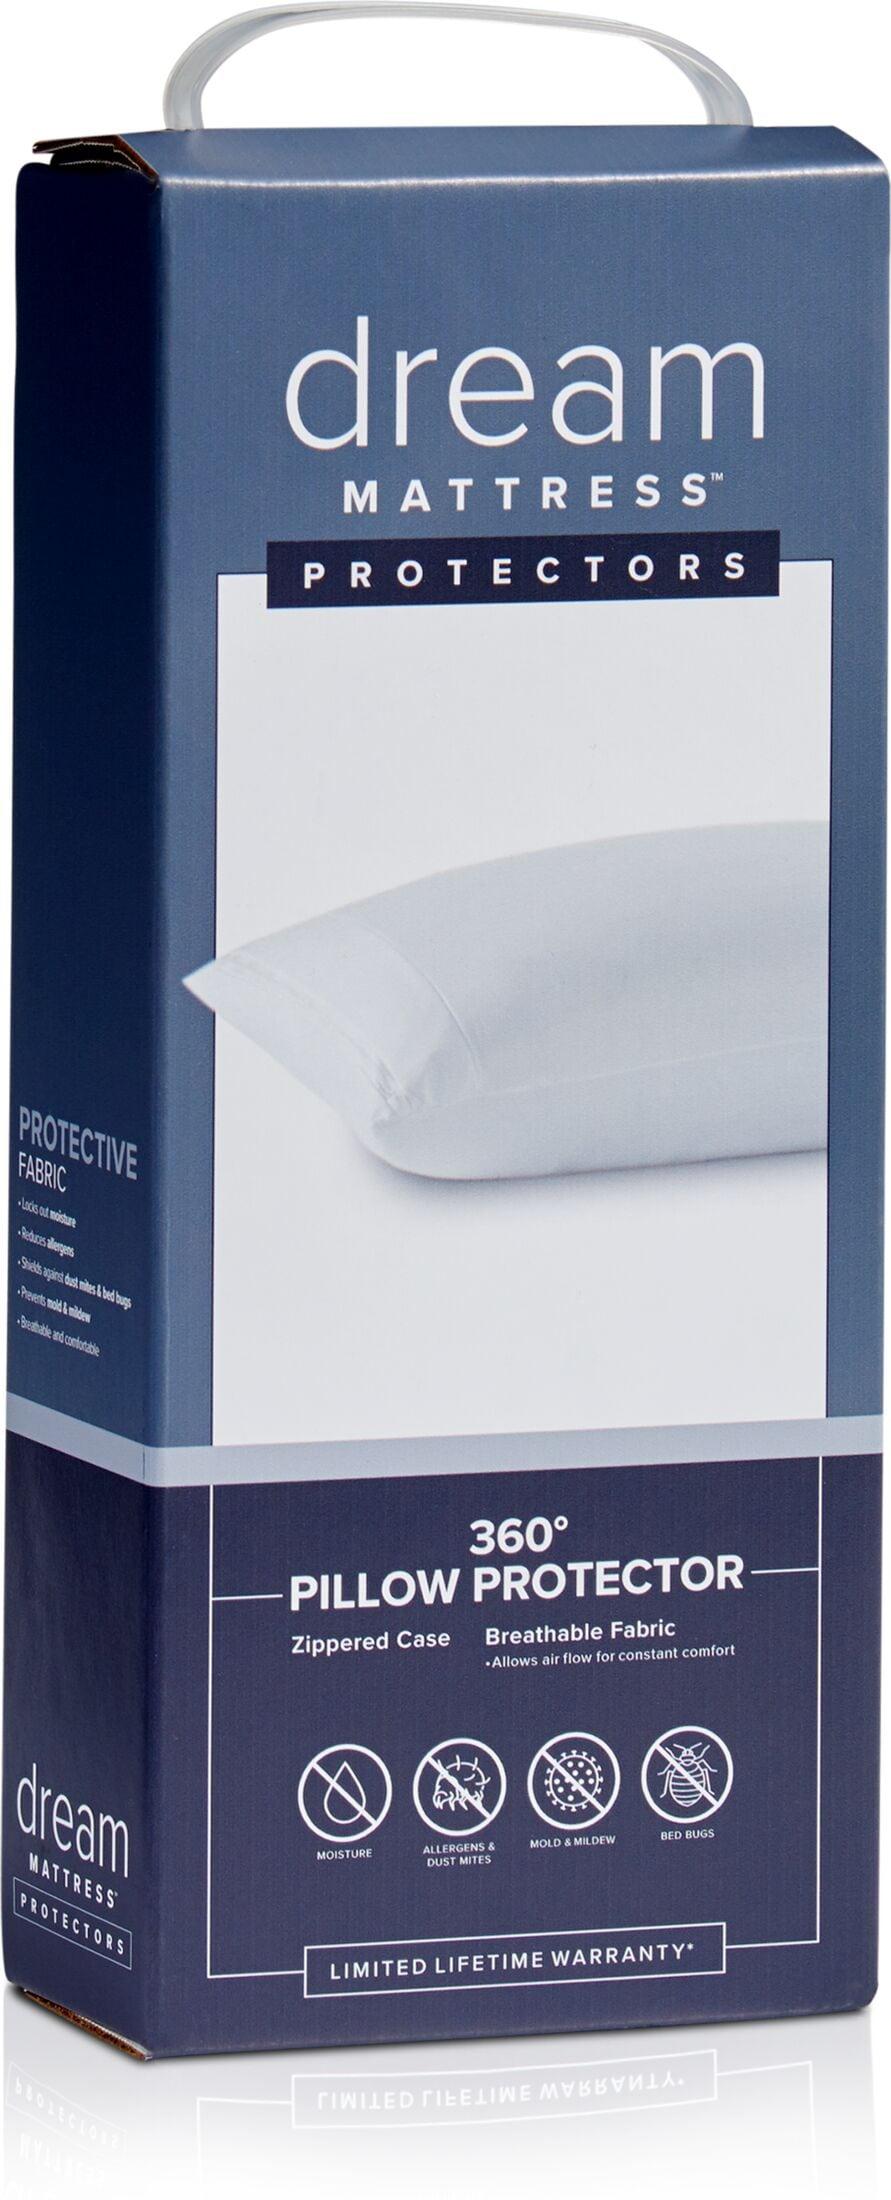 Mattresses and Bedding - Dream Queen 360 Pillow Protector